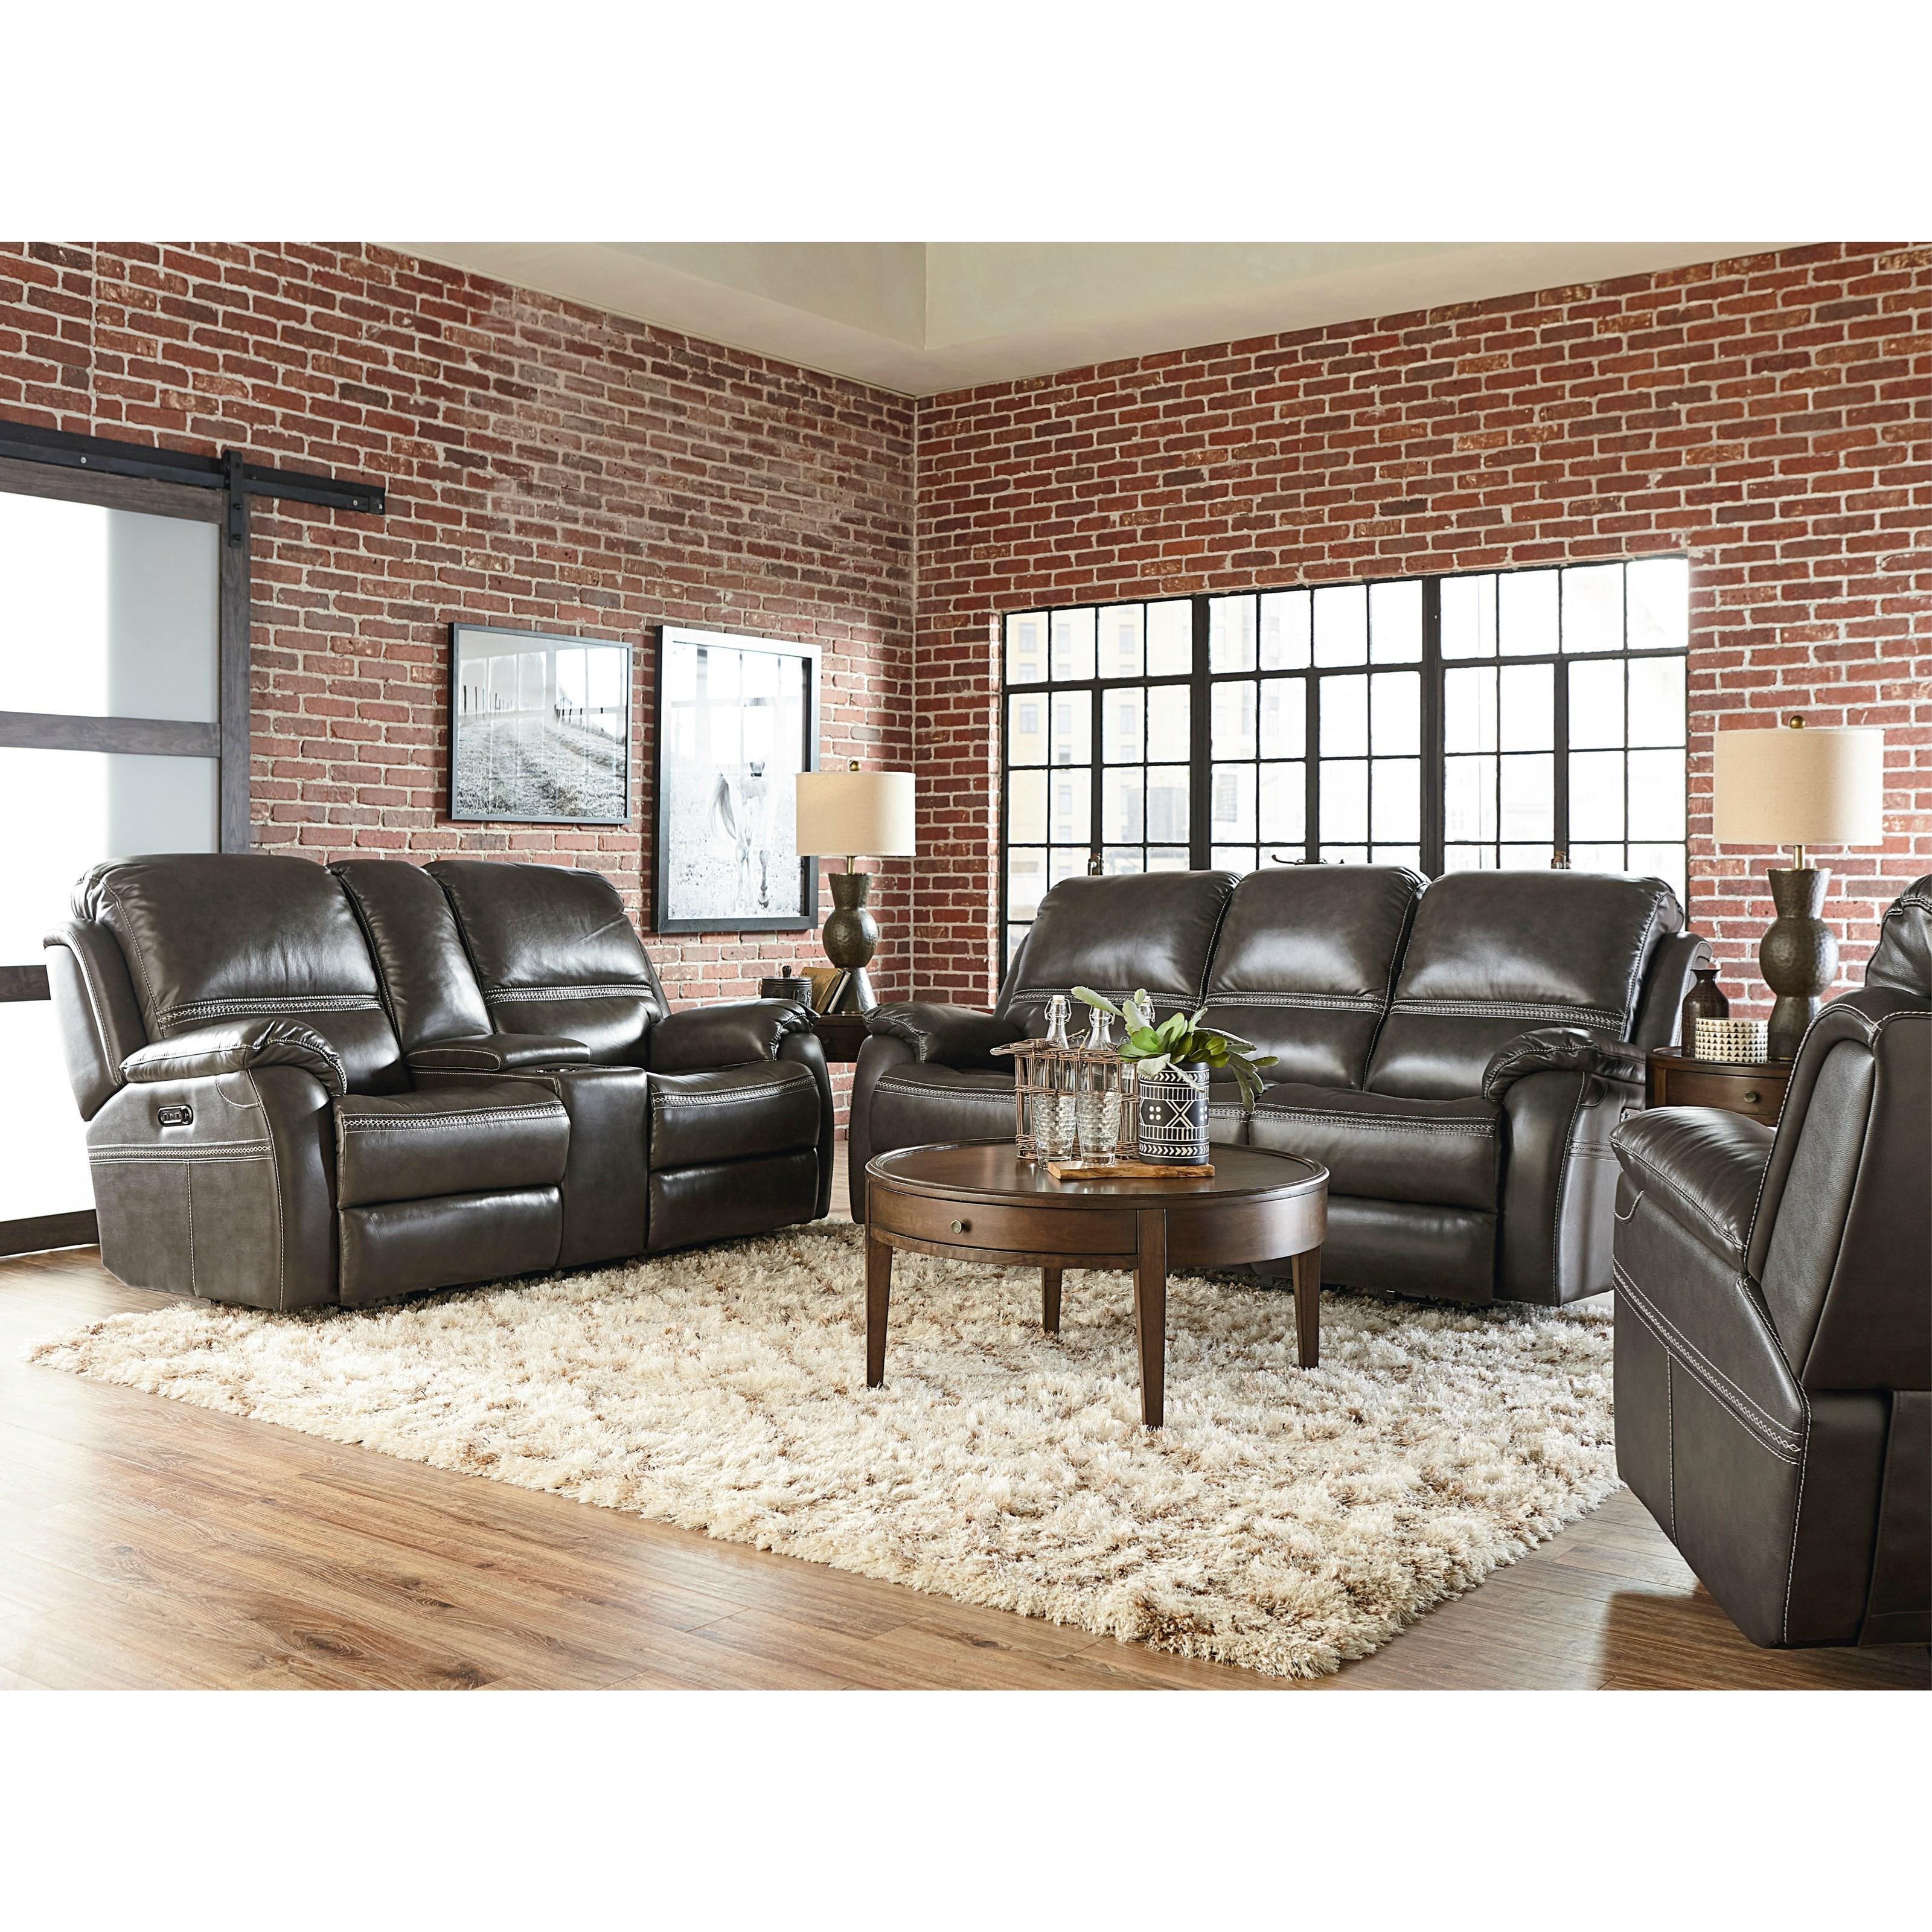 Williams - Club Level by Bassett Power Reclining Living Room Group by Bassett at Bassett of Cool Springs